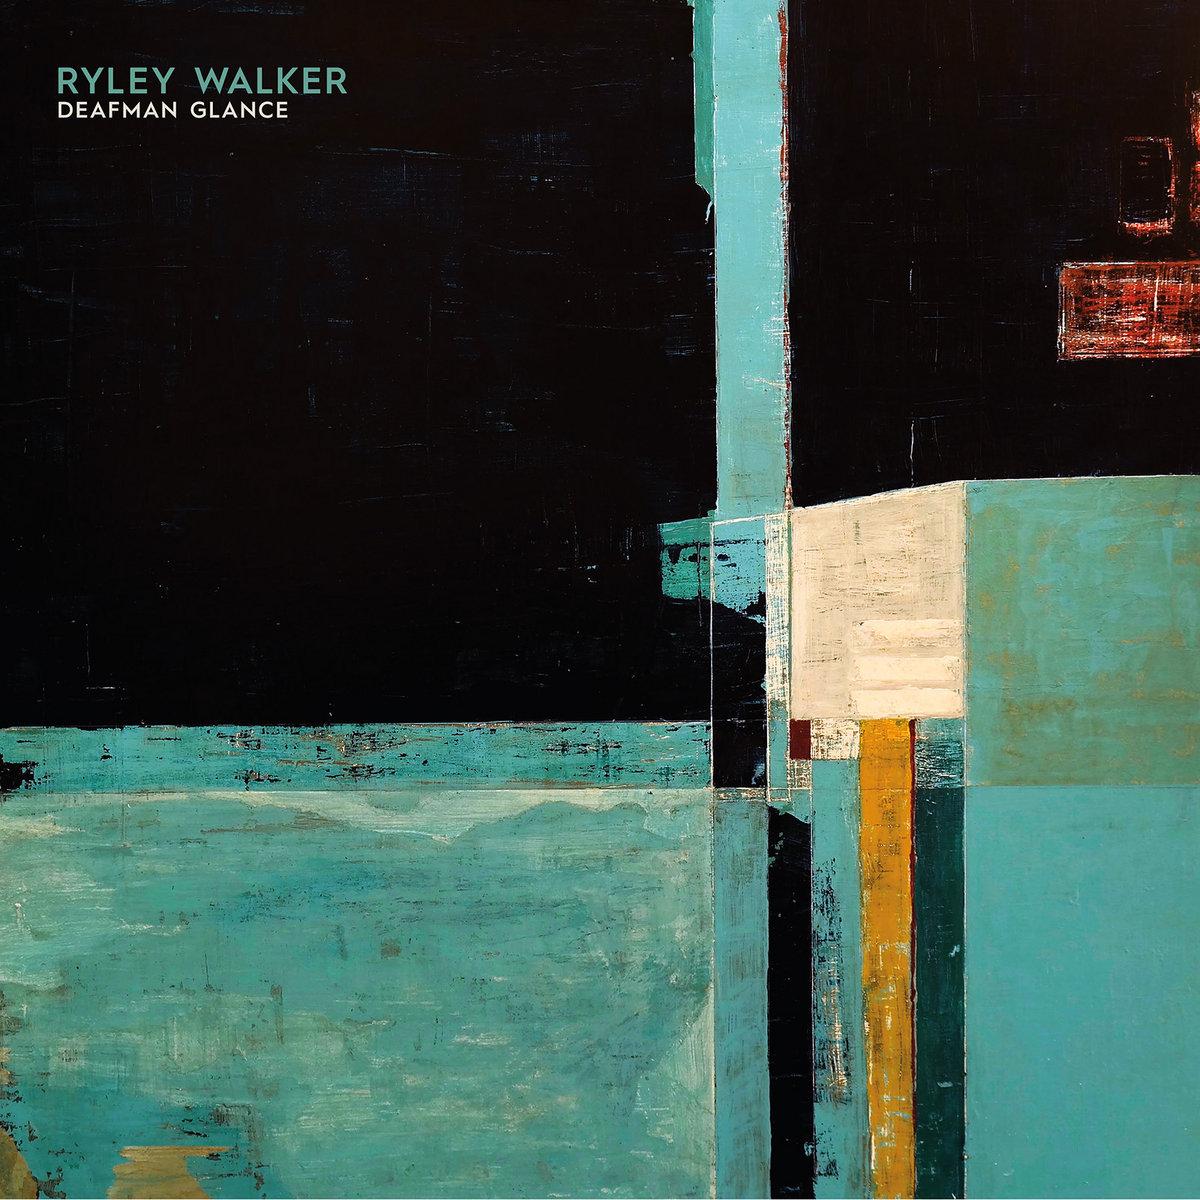 Ryley Walker Deafman Glance